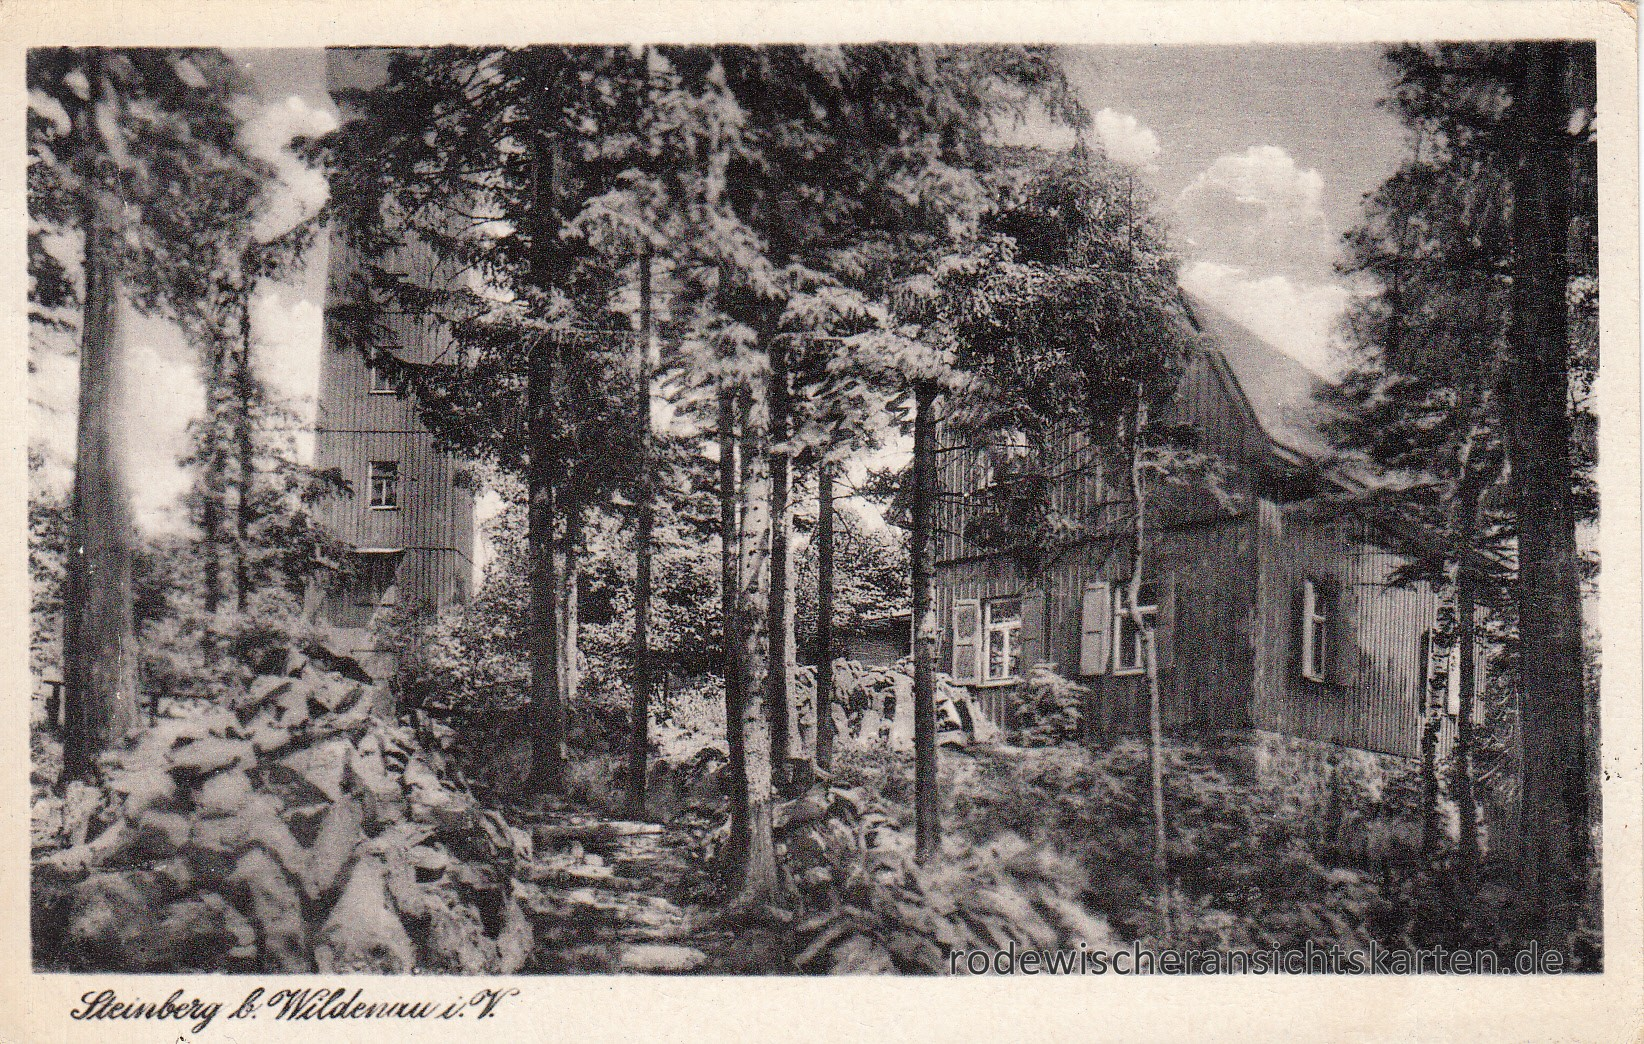 Steinberg 1957 (1)